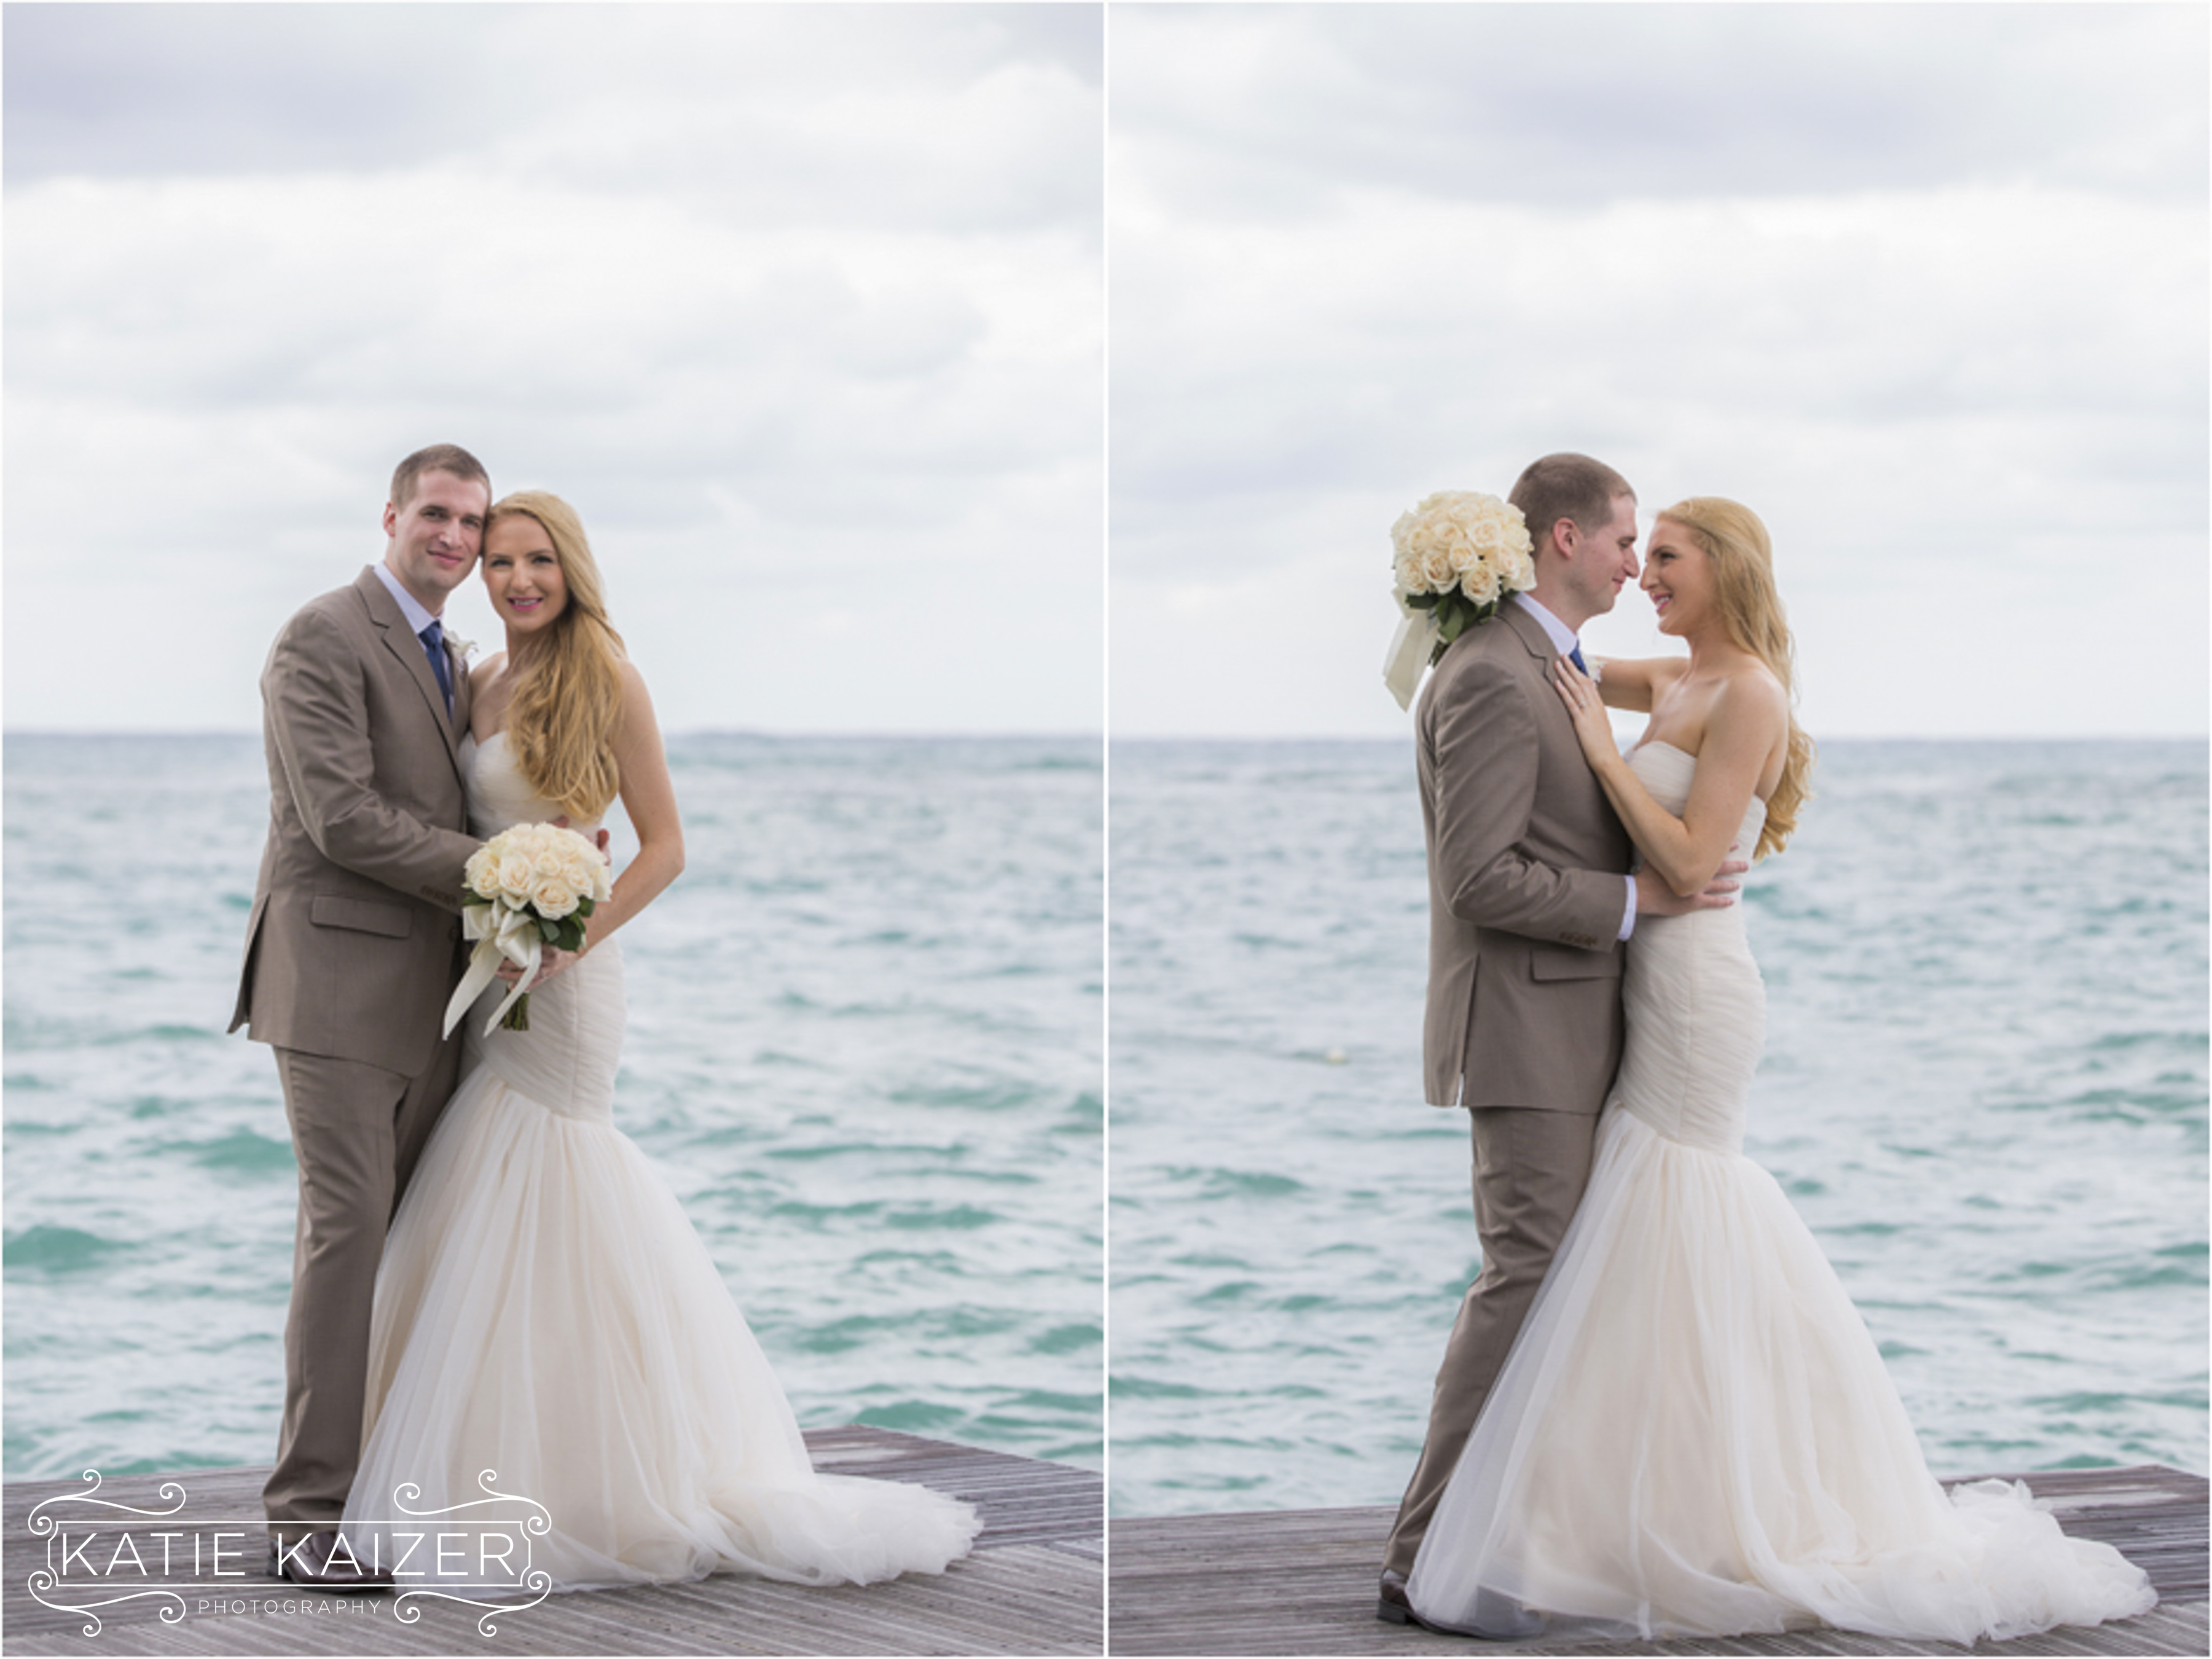 Brihgid&Mike_034_KatieKaizerPhotography